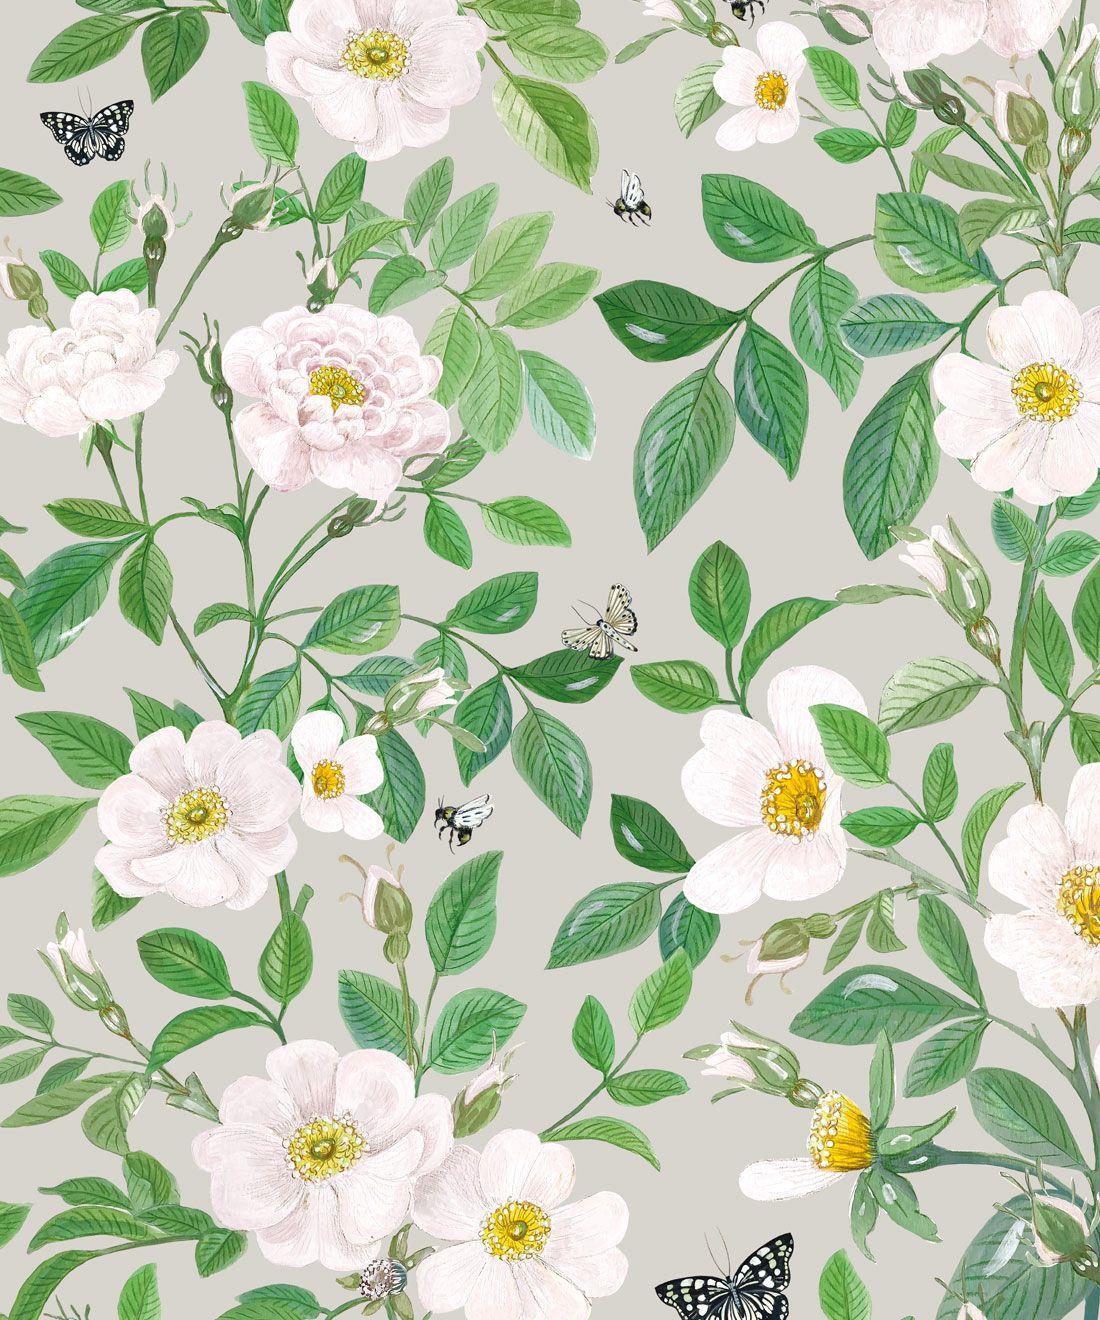 Rosa Wallpaper • Floral Wallpaper • Beige •Swatch